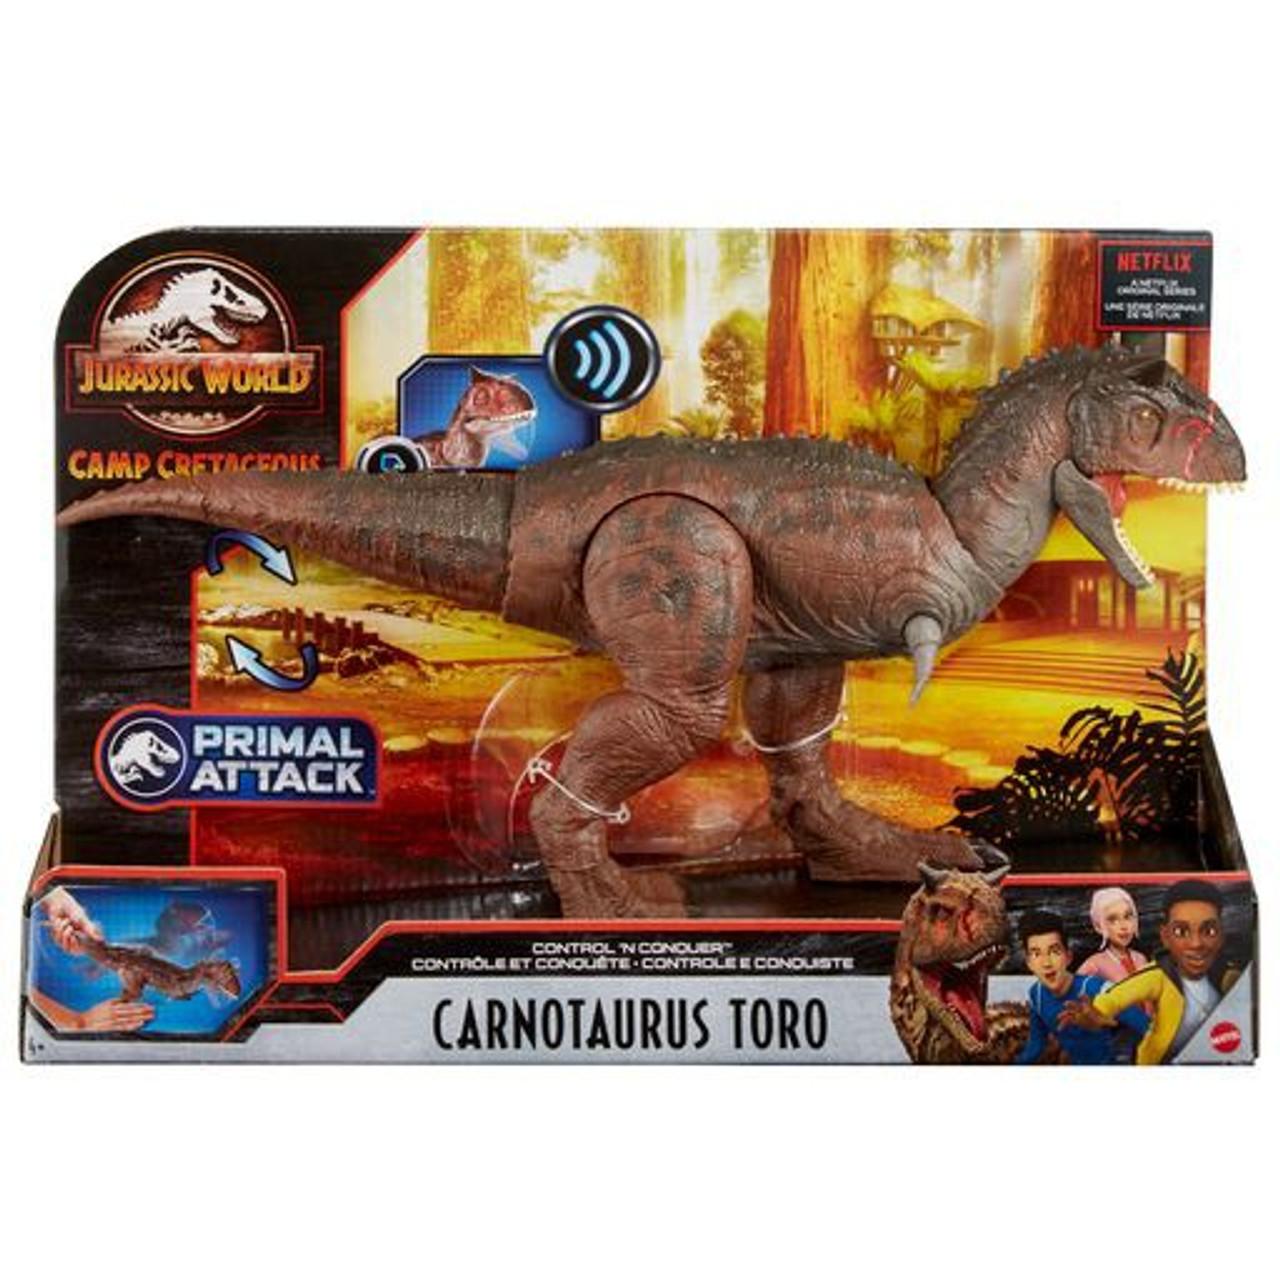 Jurassic World Camp Cretaceous Control N Conquer Carnotaurus Toro Action Figure Mattel Toywiz Enter the world's most incredible adventure camp: jurassic world